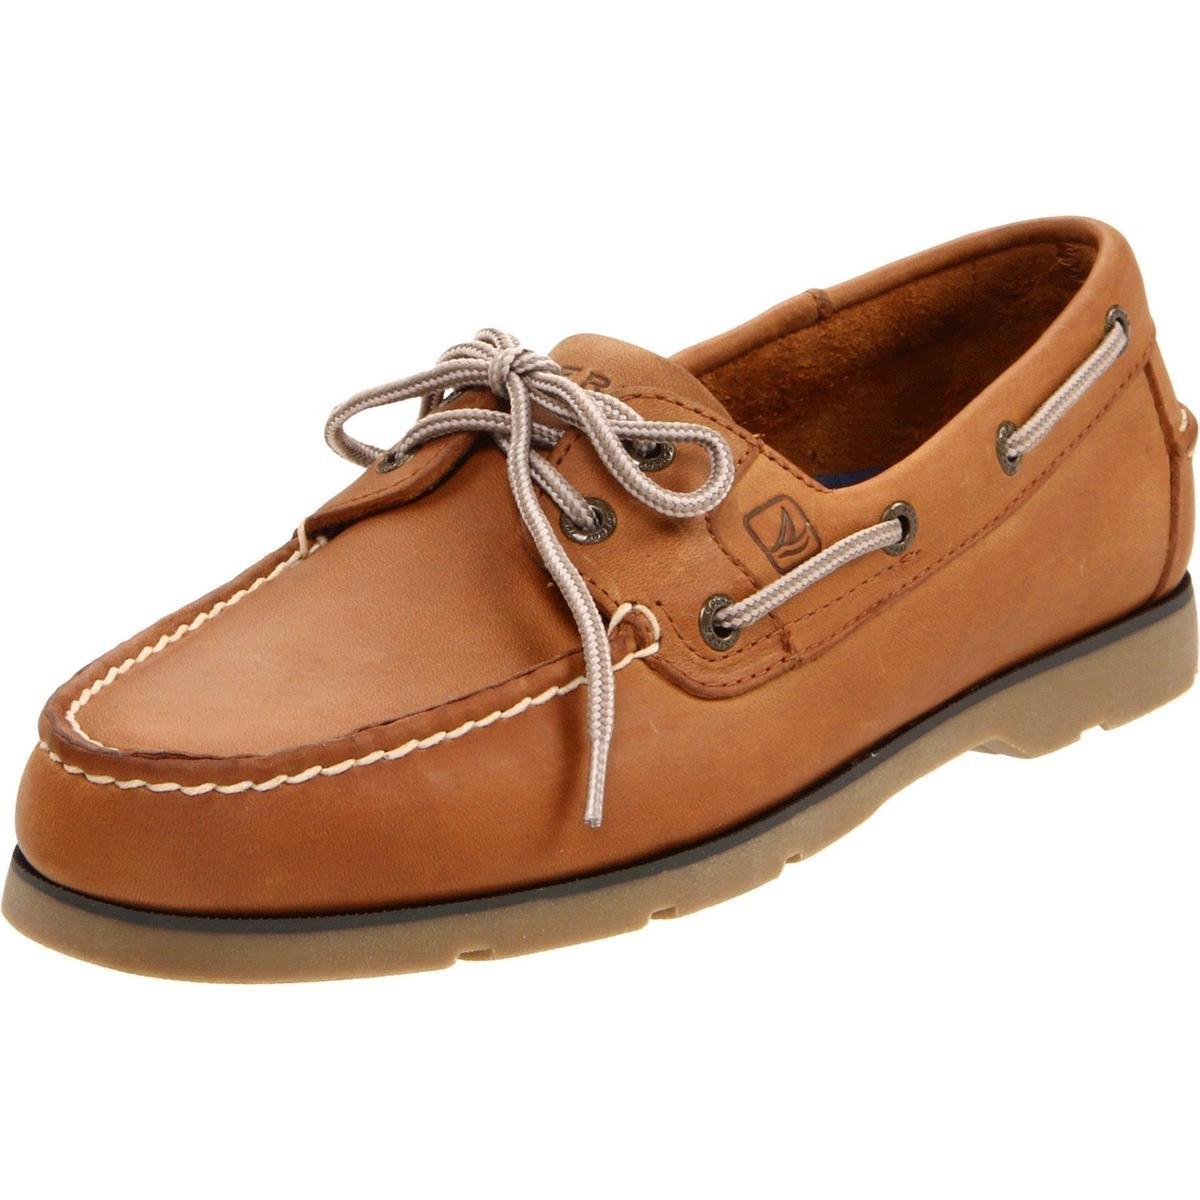 Sperry Top-Sider Men's Leeward Boat Shoe,Sahara,11 M US